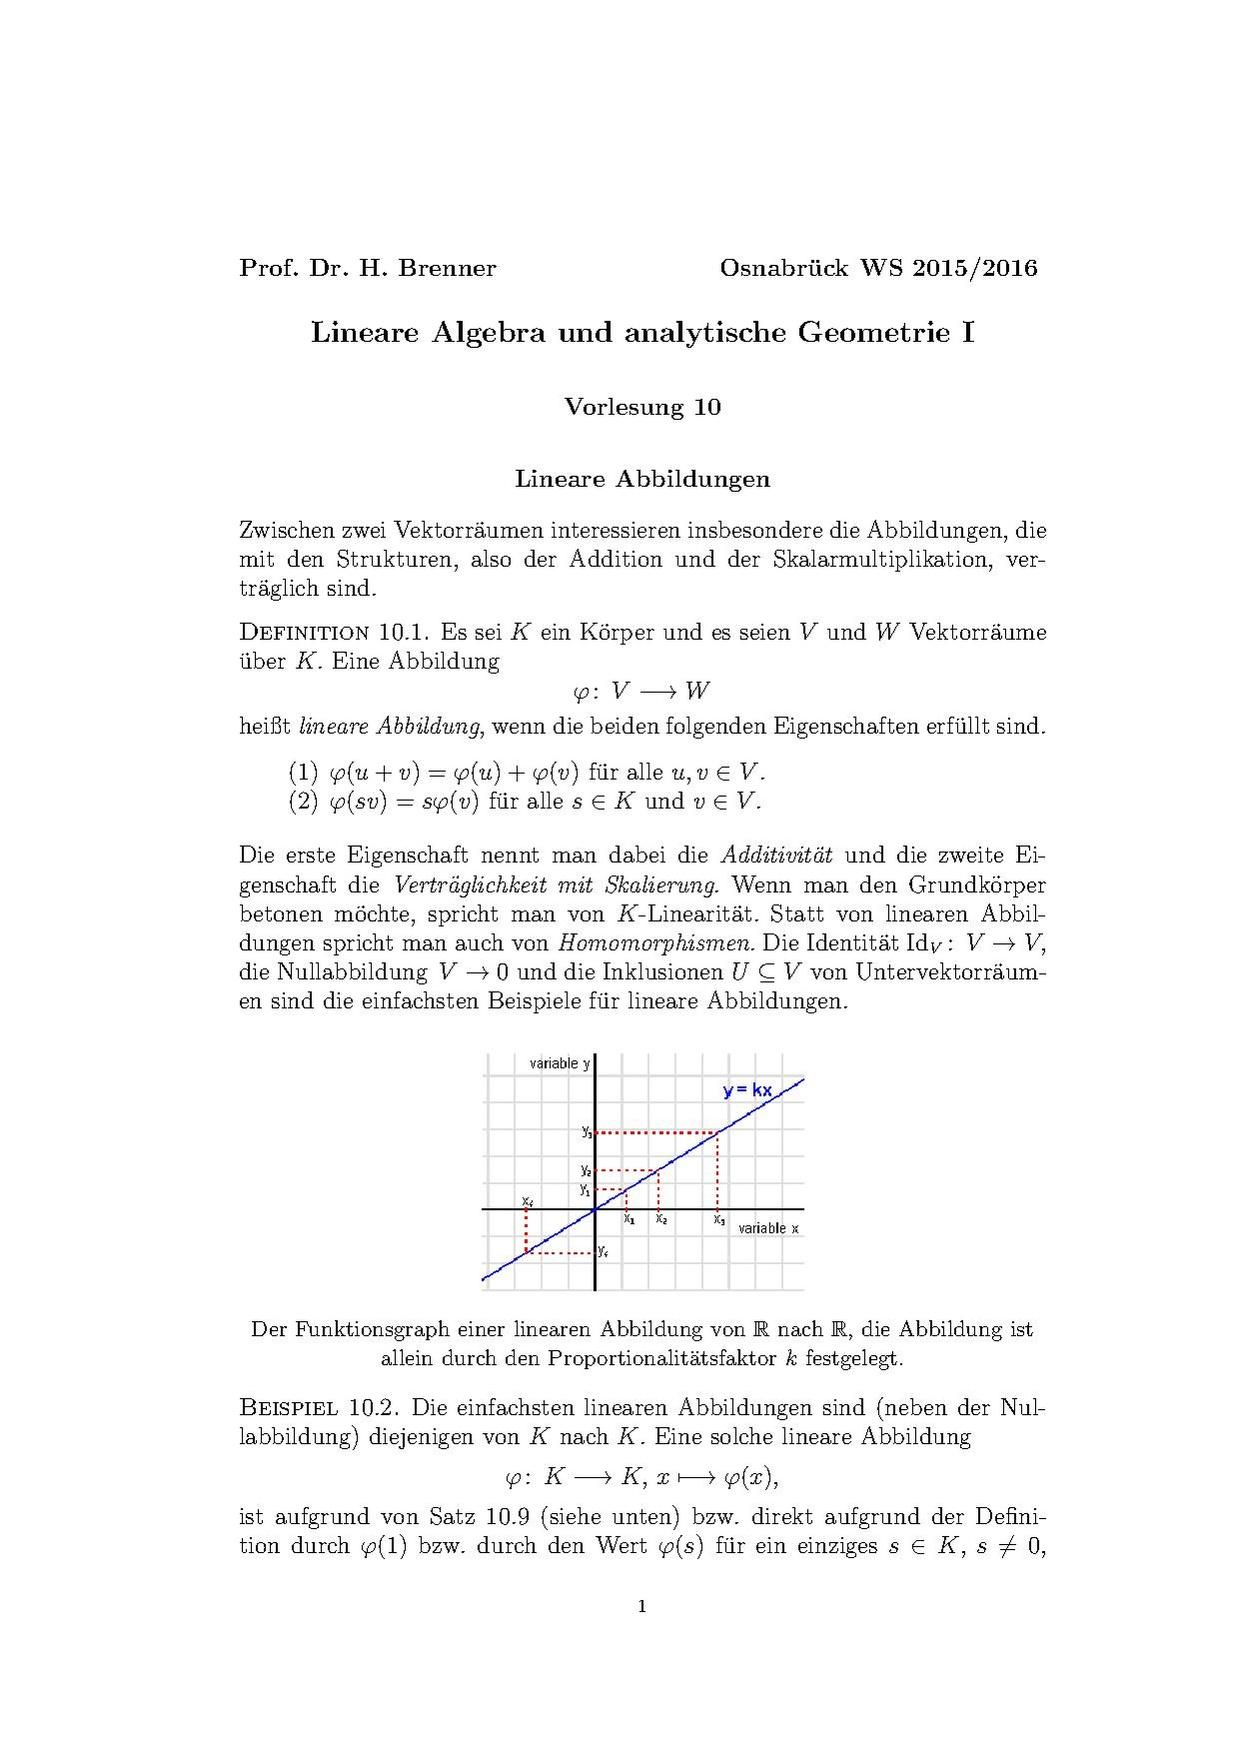 File:Lineare Algebra (Osnabrück 2015-2016)Teil IVorlesung10.pdf ...